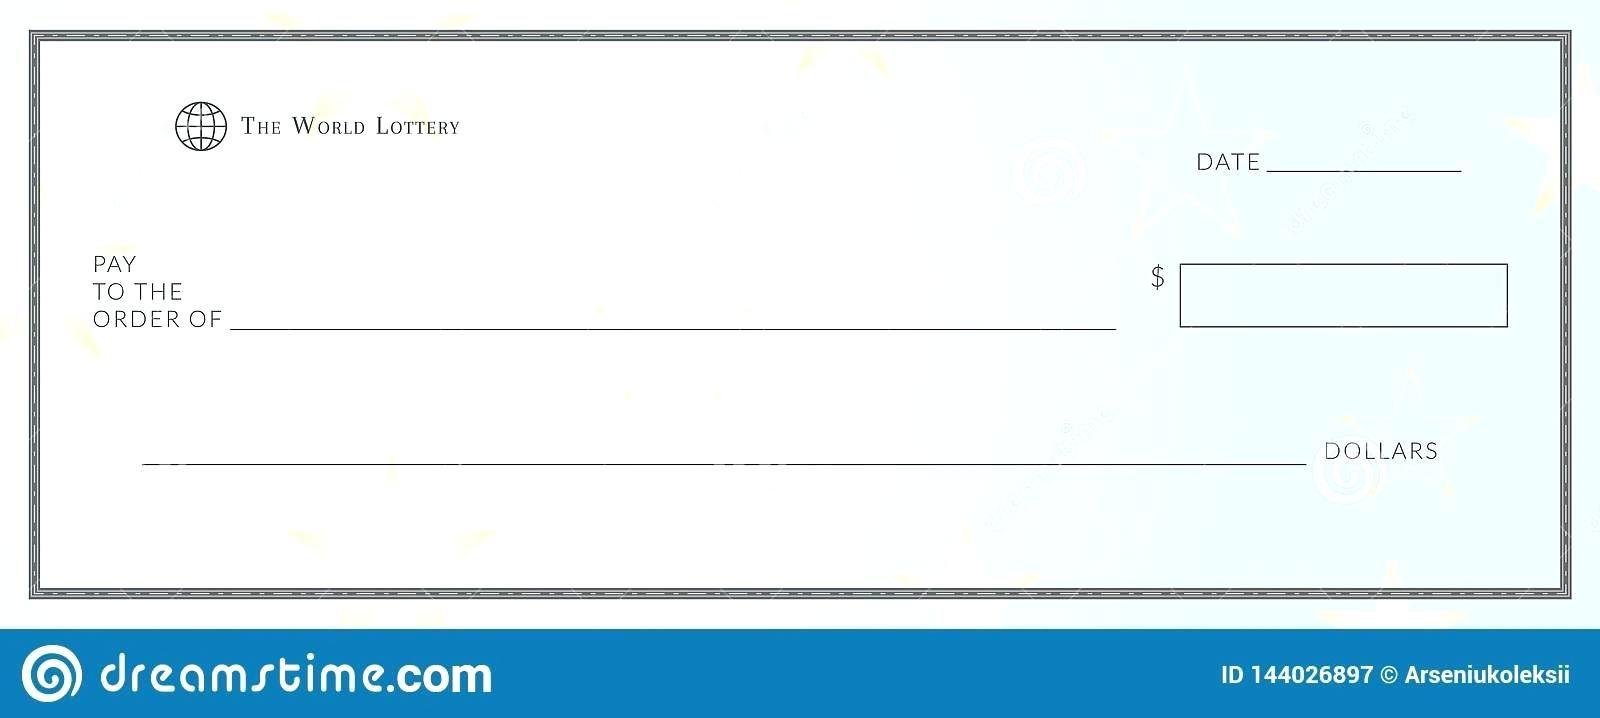 003 Unforgettable Free Printable Ticket Stub Template Example Full